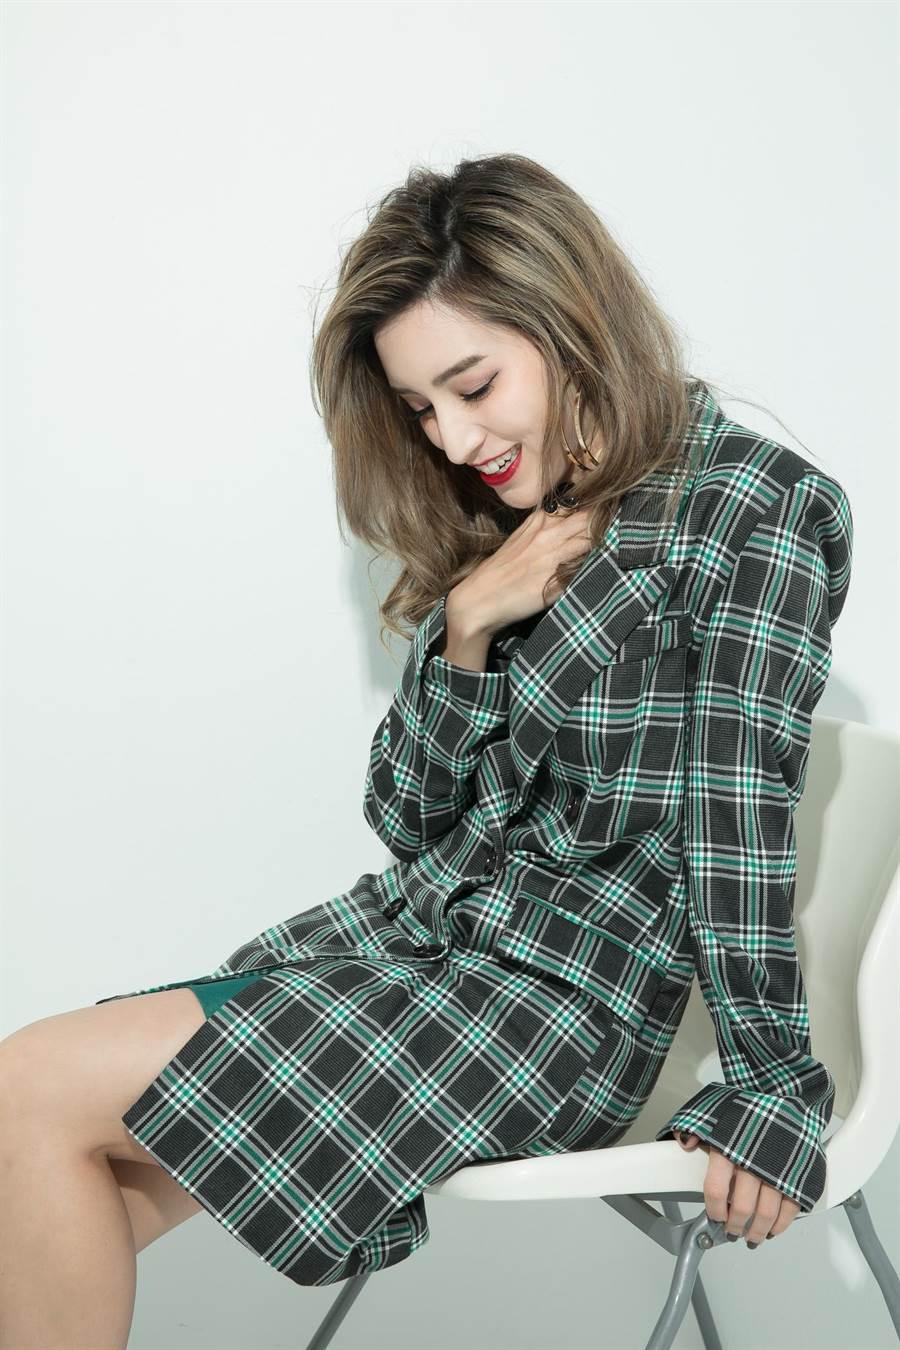 Lara近日推出新單曲。(vogue國際中文版提供)